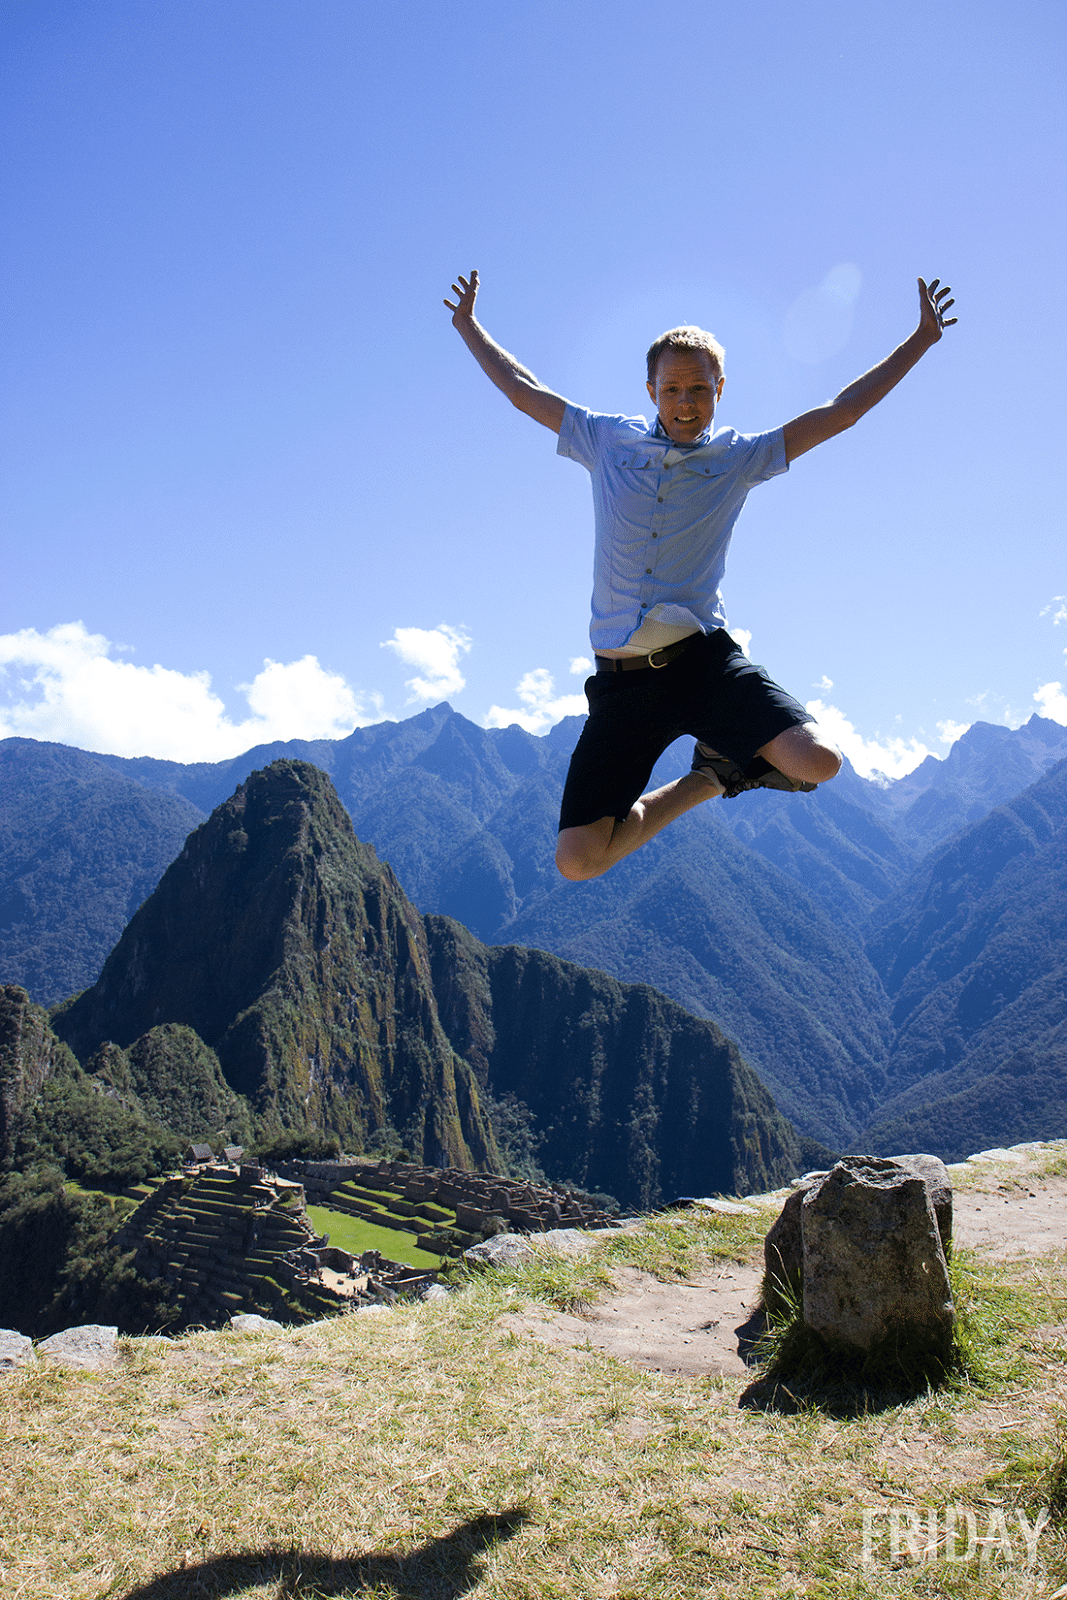 Bucketlist Picture- Machu Picchu Jumping